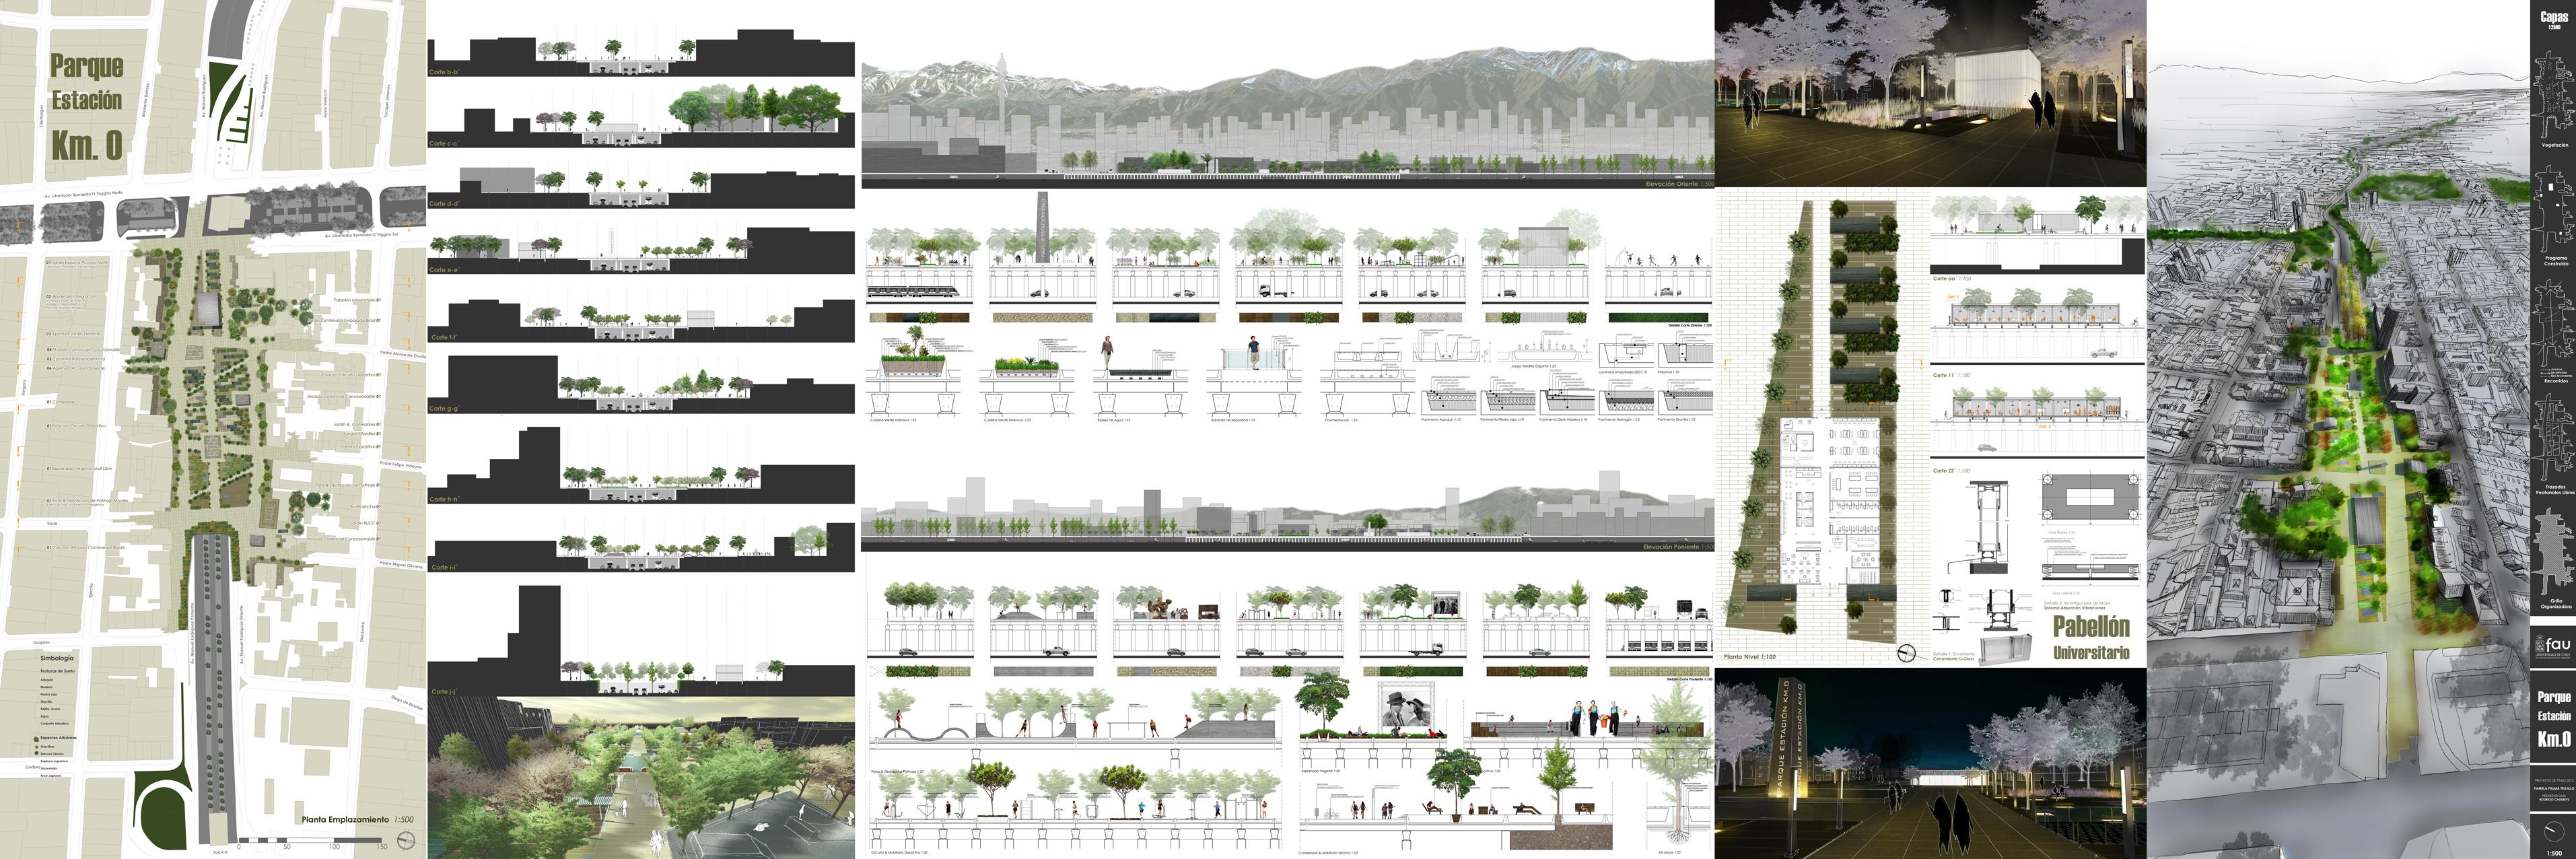 Parque estaci n km 0 configuraci n de espacio p blico for Laminas arquitectura